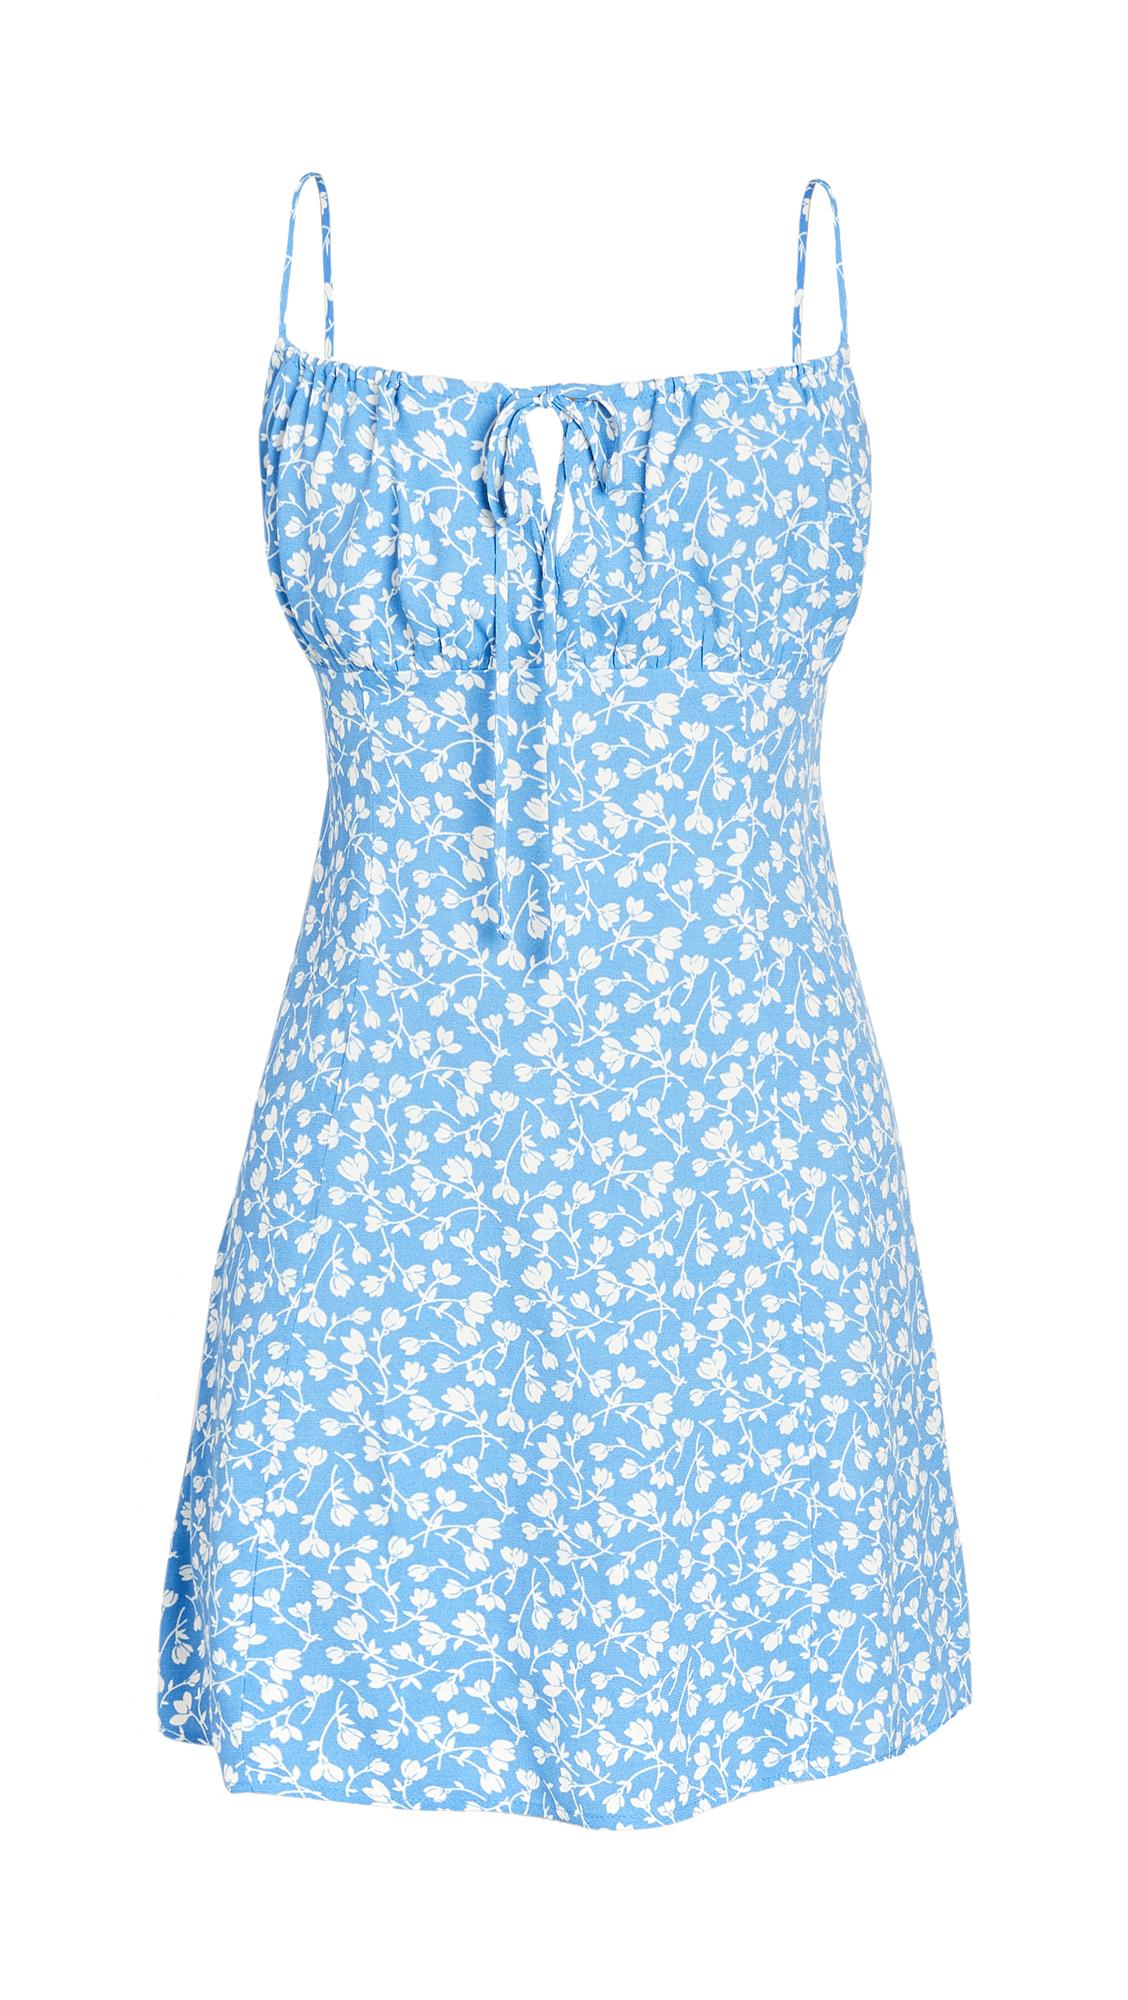 Reformation Cashio Dress